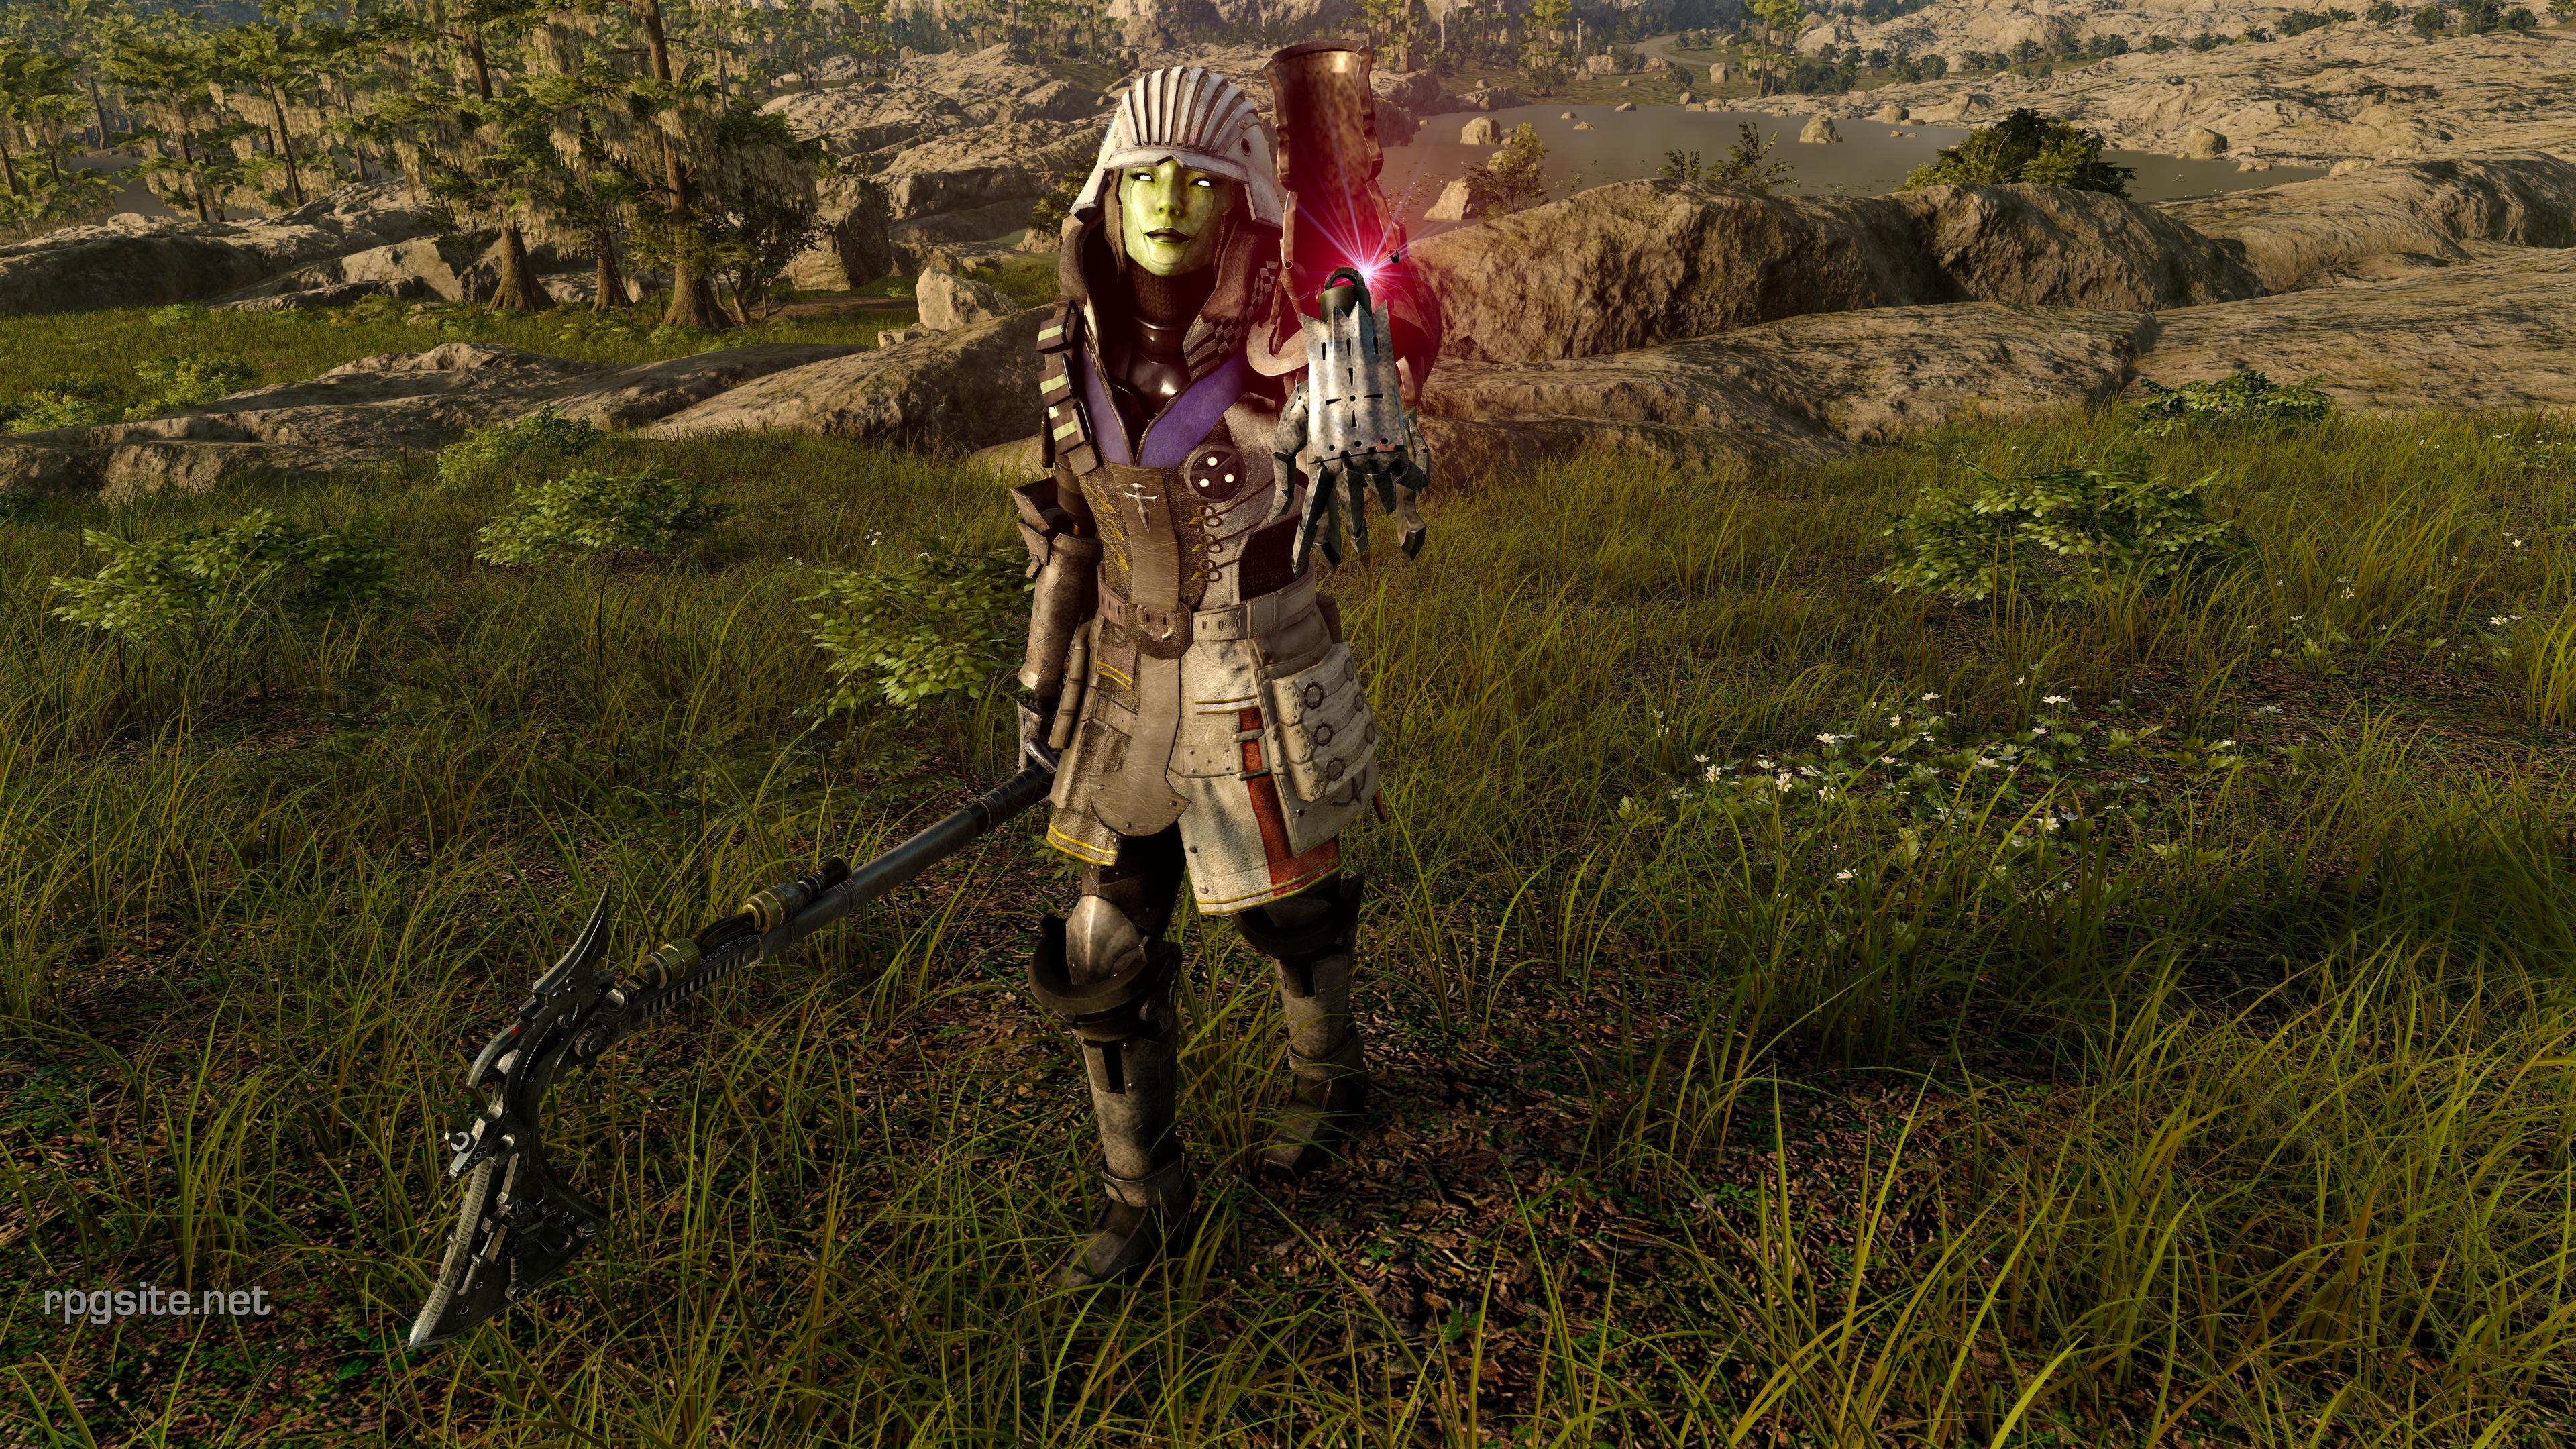 Final Fantasy 15's PC version supports Nvidia Ansel, so